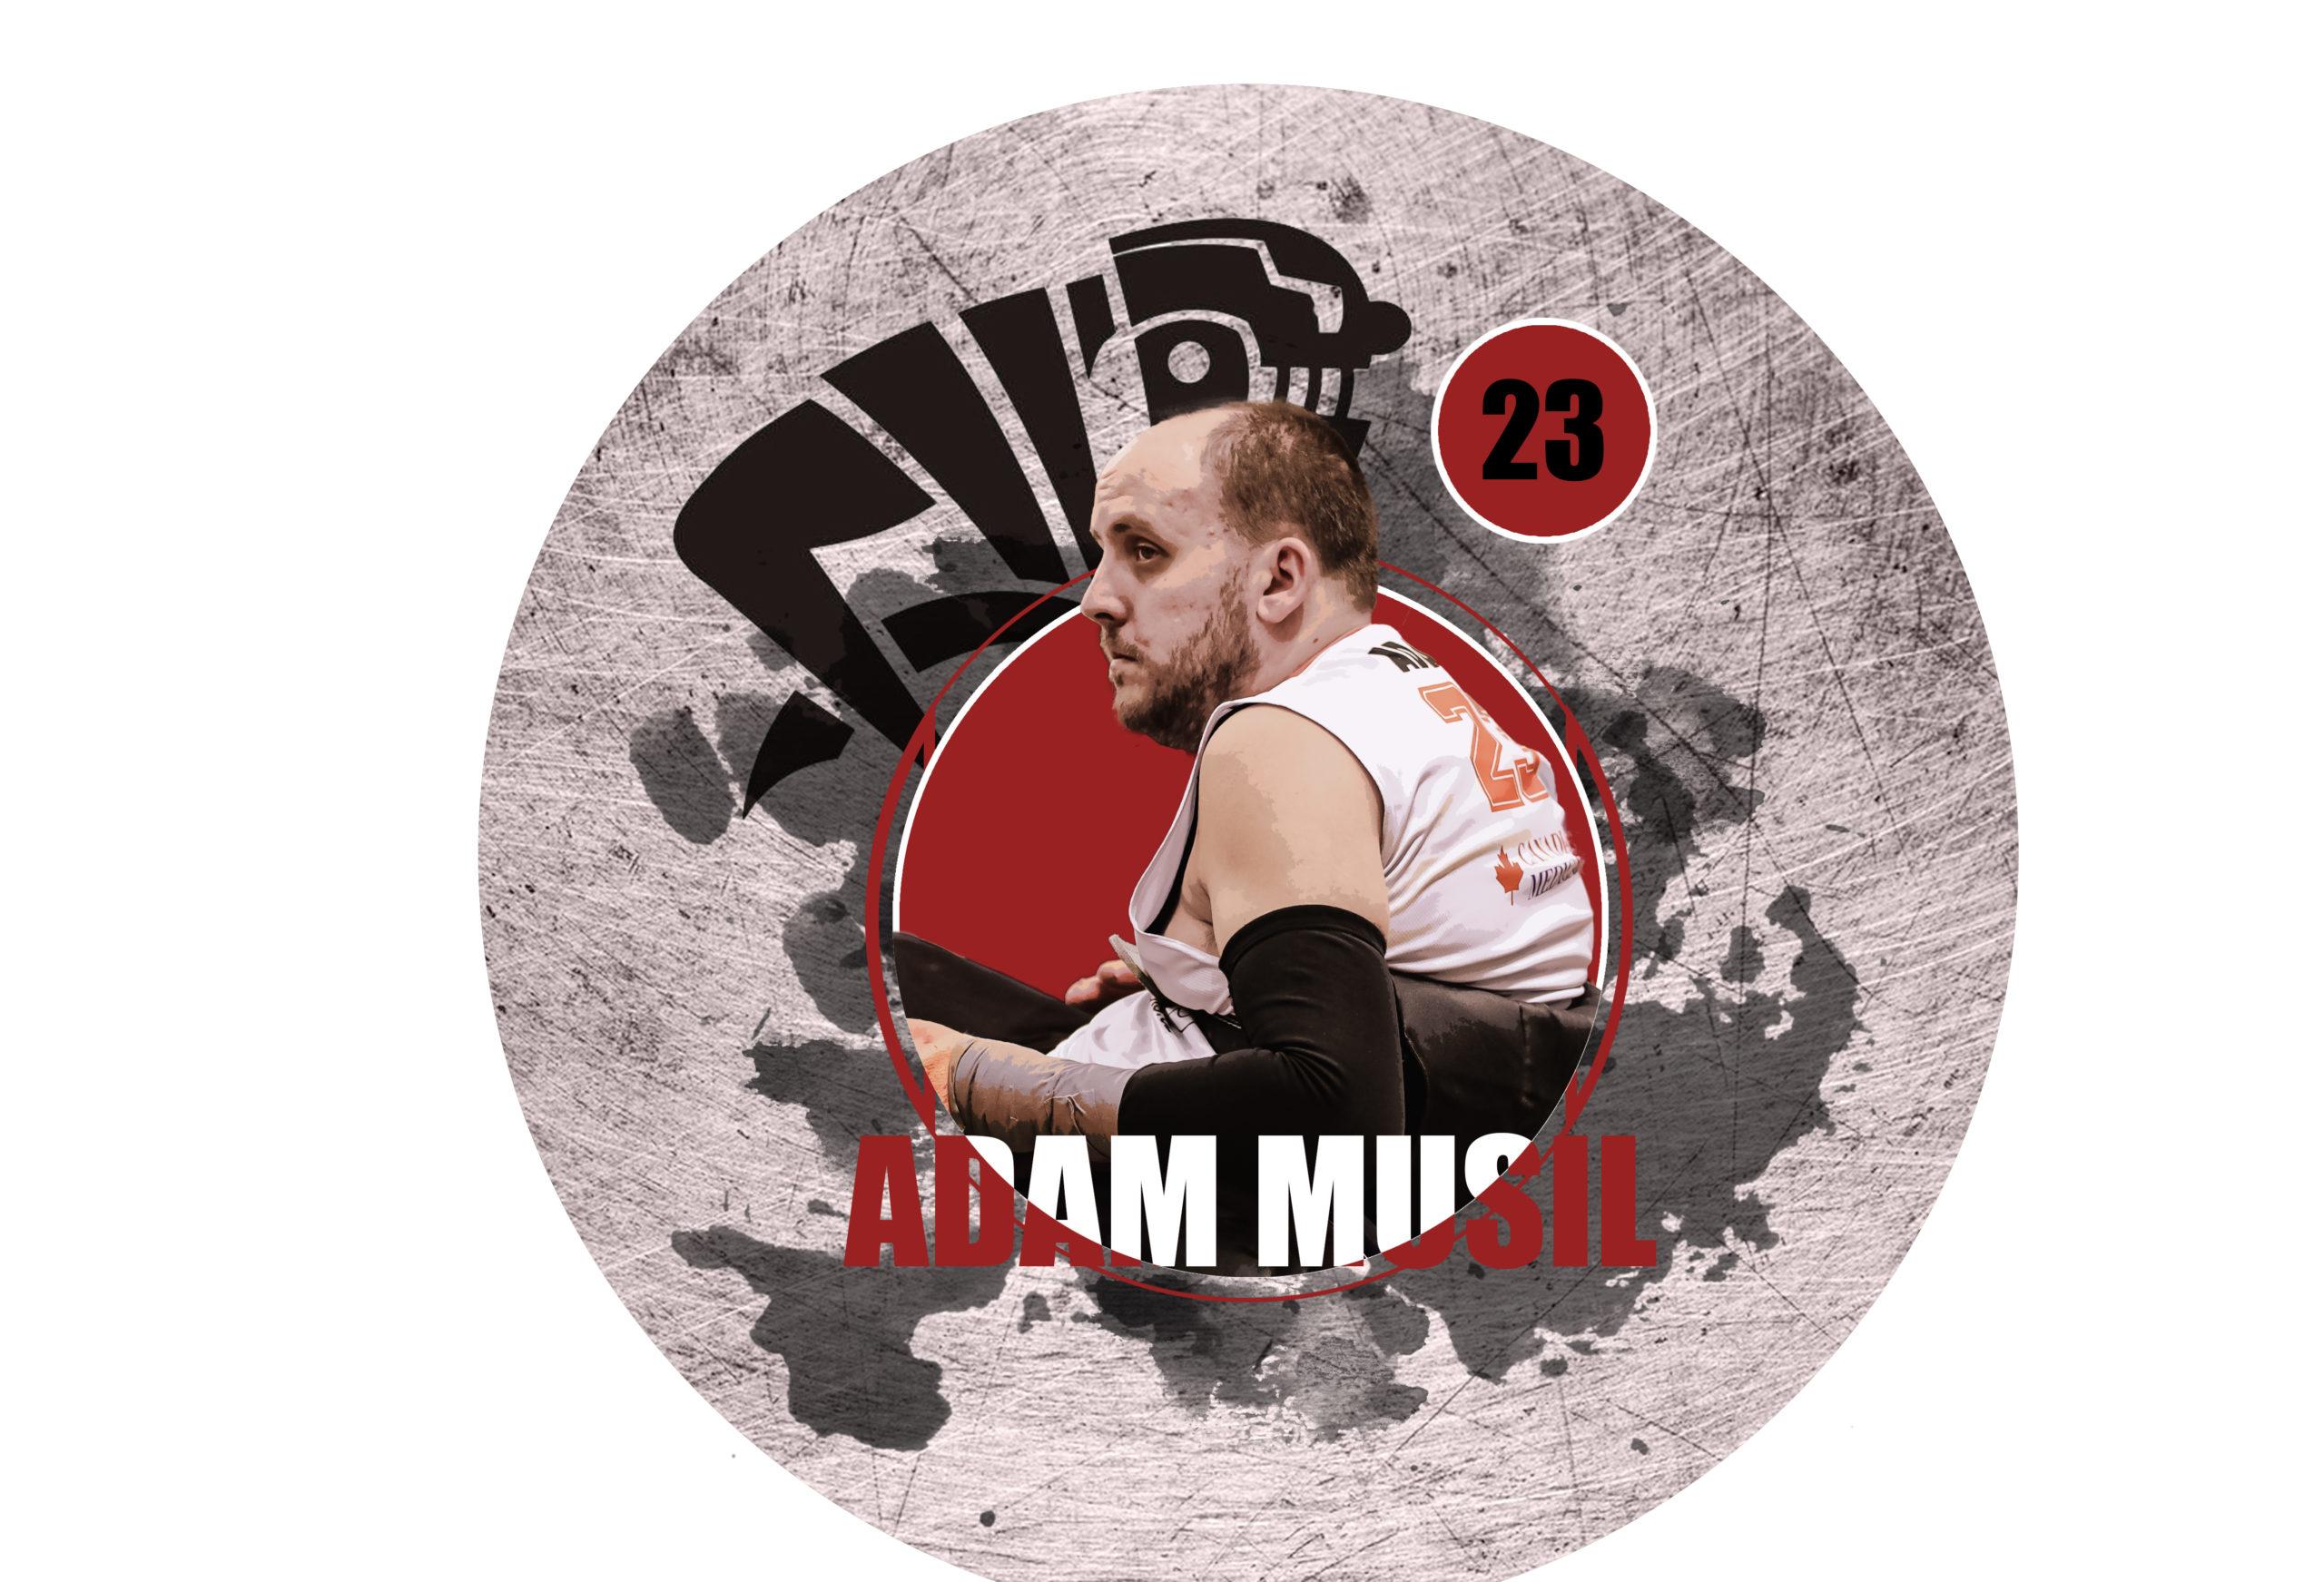 Adam-Musil-1